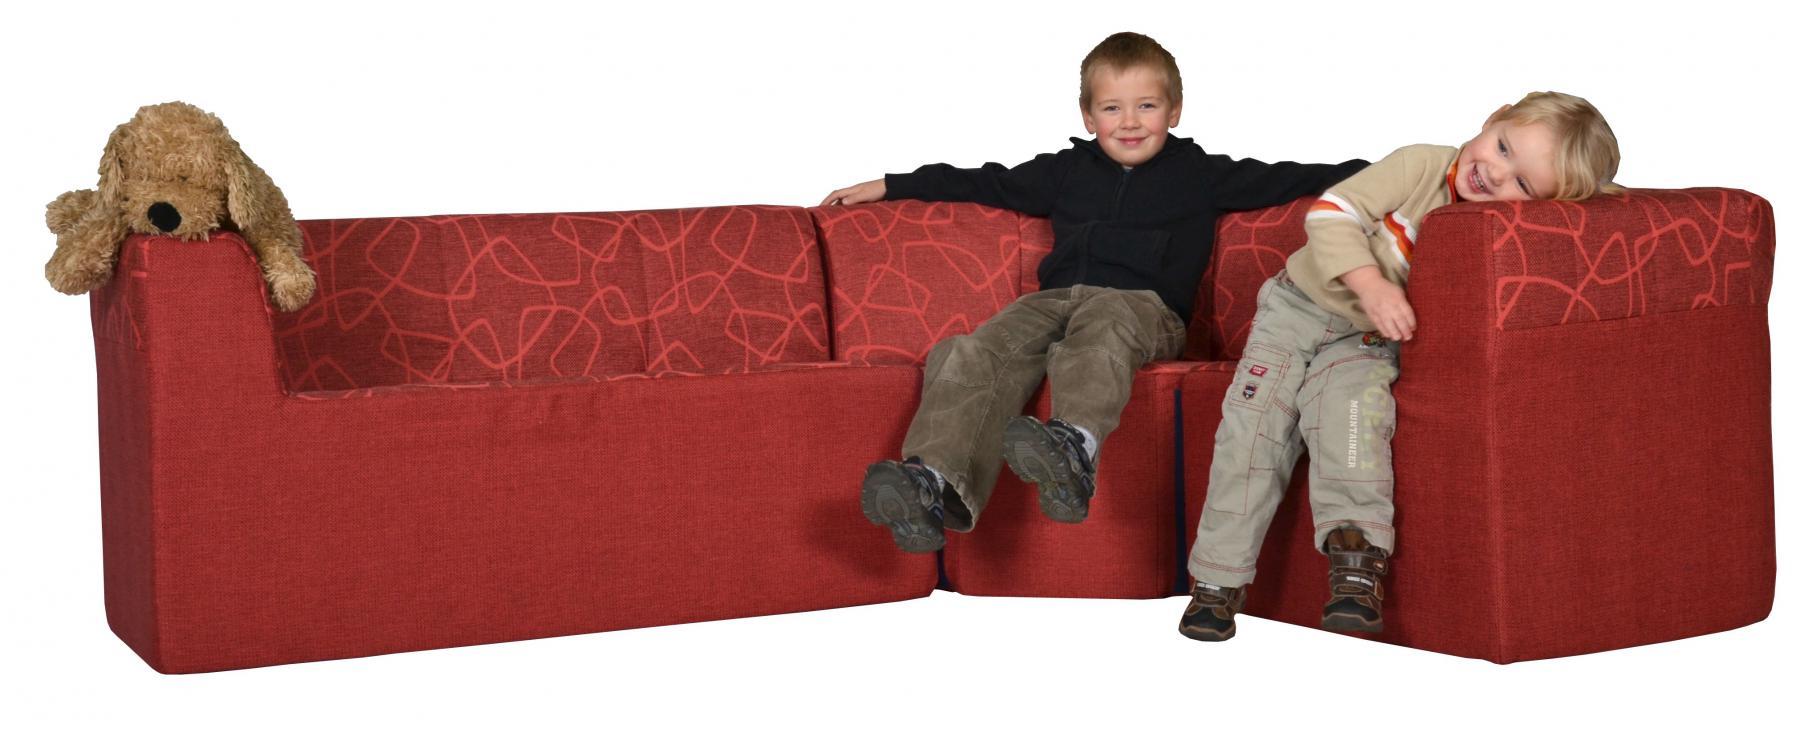 Bänfer Eckcouch Maxi Sofa 3 Teilig Rechts Länger Couch Farbwahl